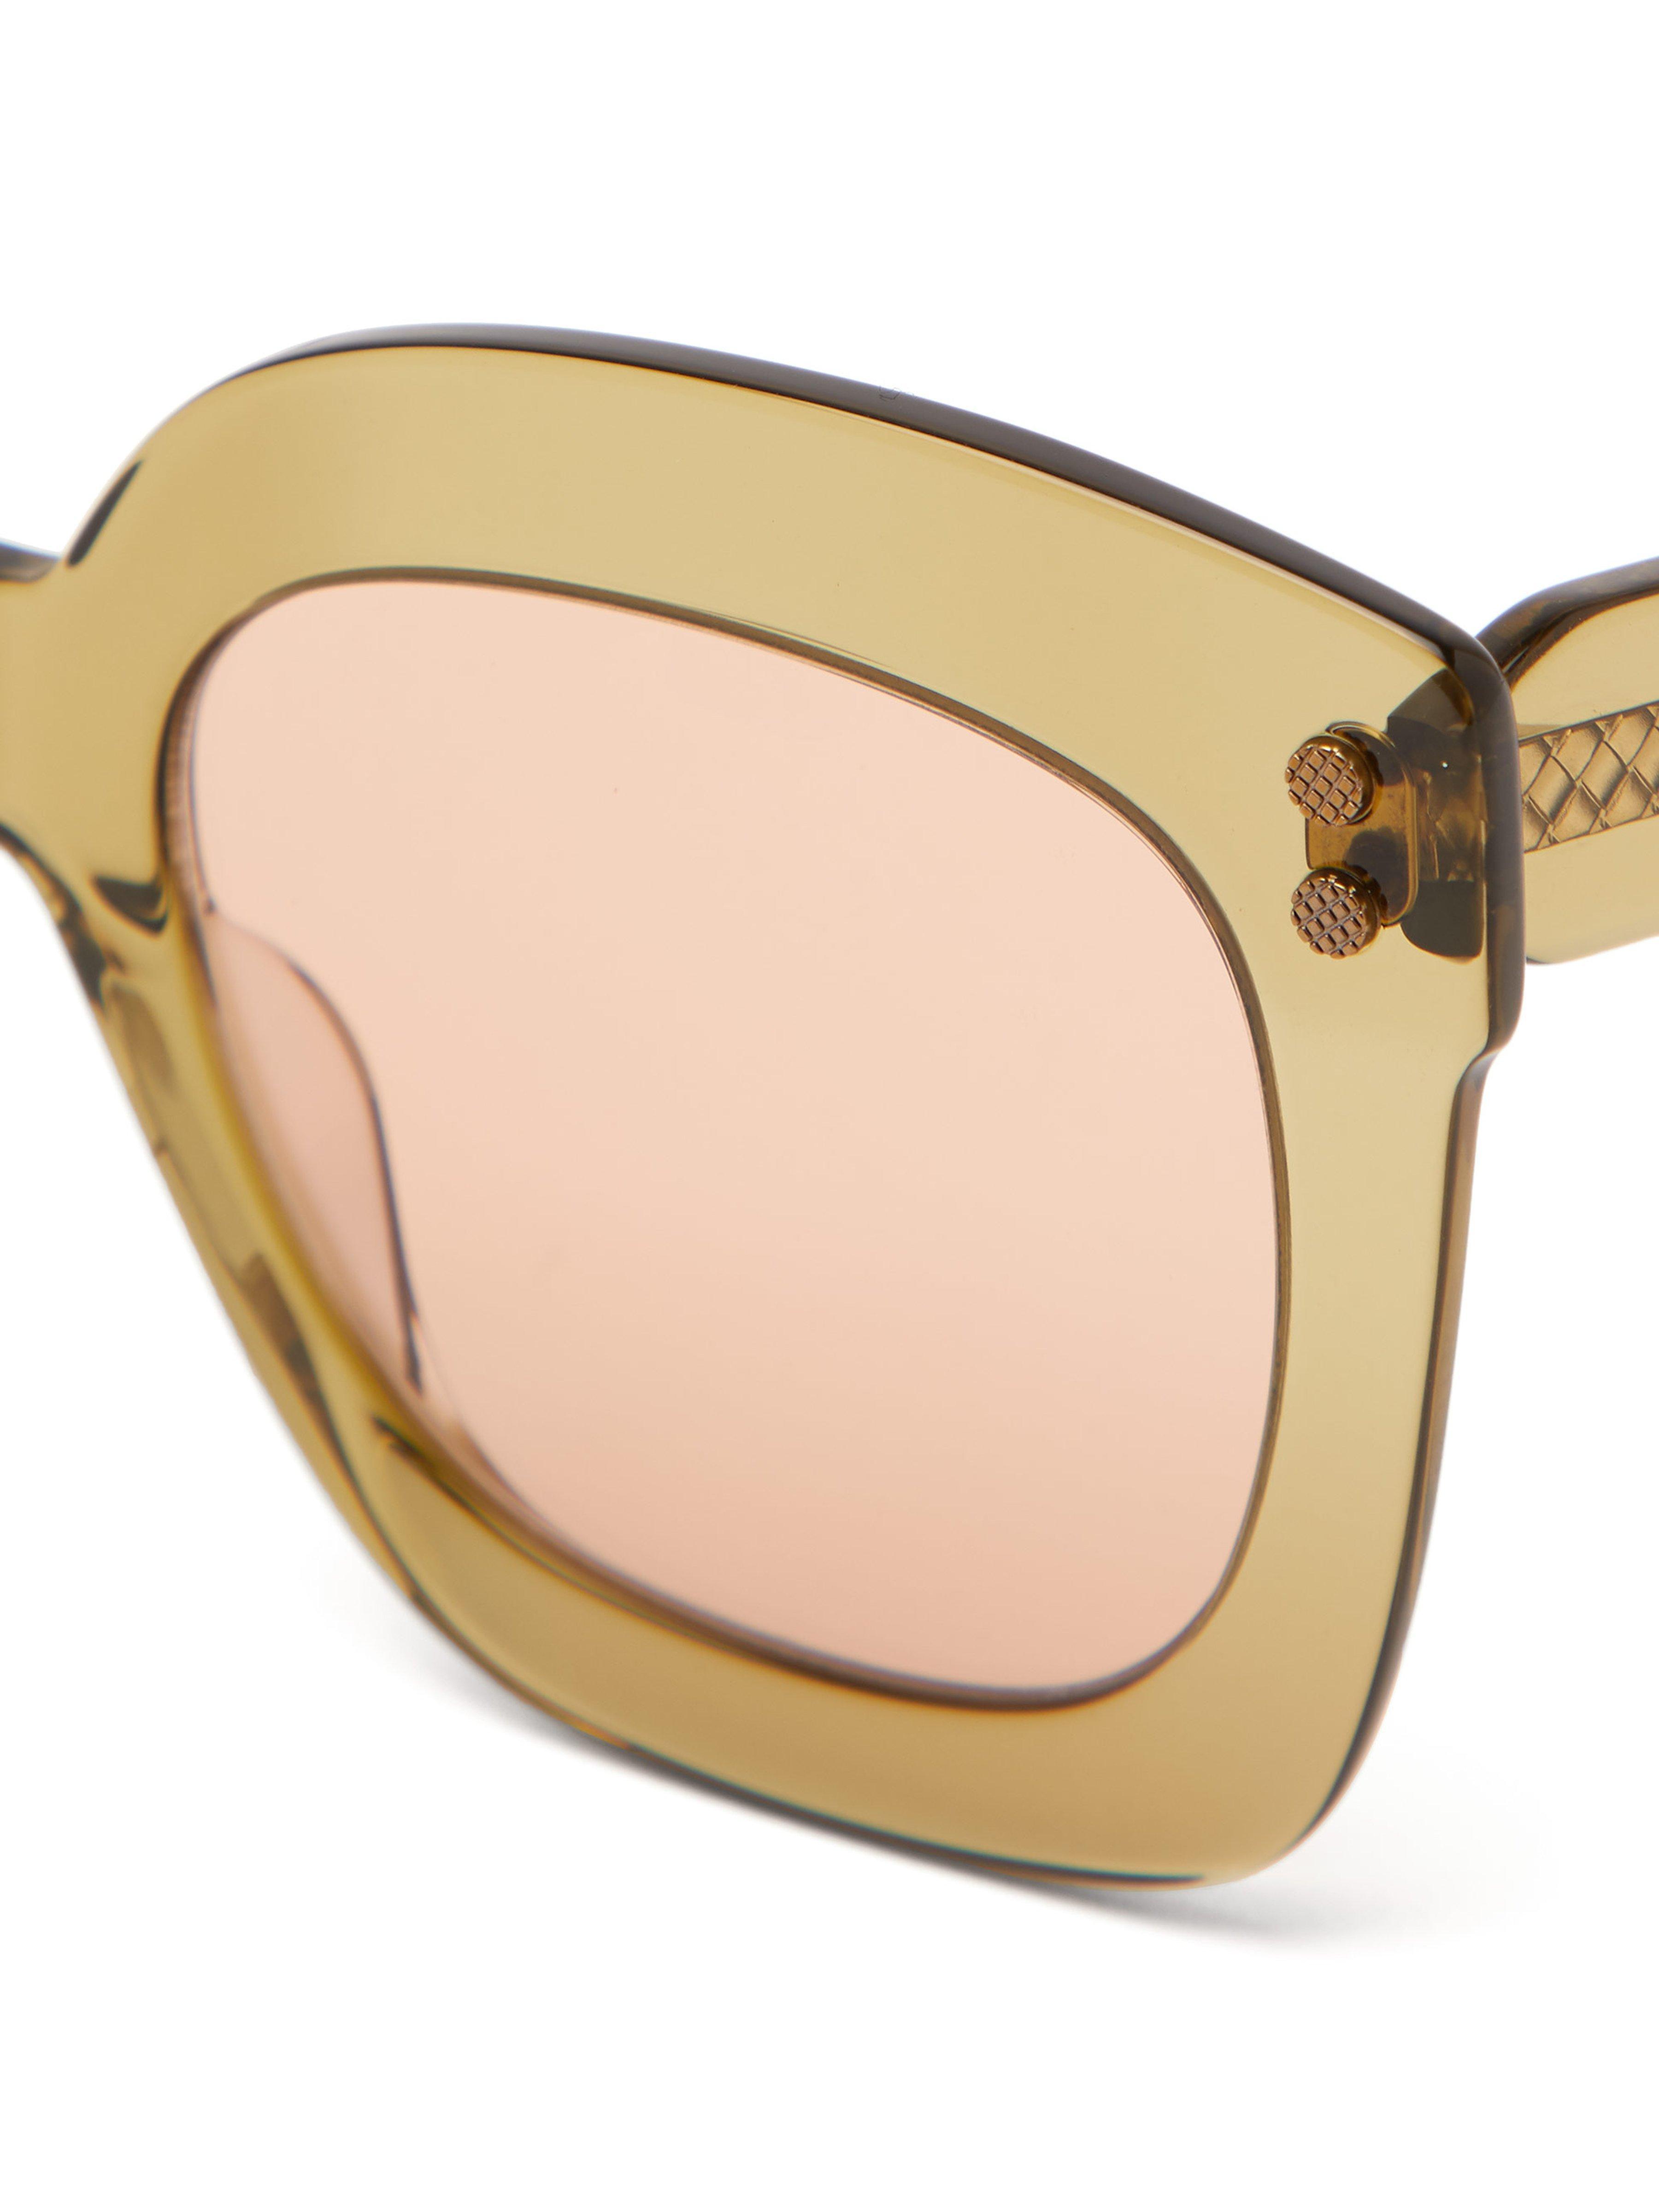 b6226c3470c64 Bottega Veneta - Green Oversized Square Cat Eye Acetate Sunglasses - Lyst.  View fullscreen